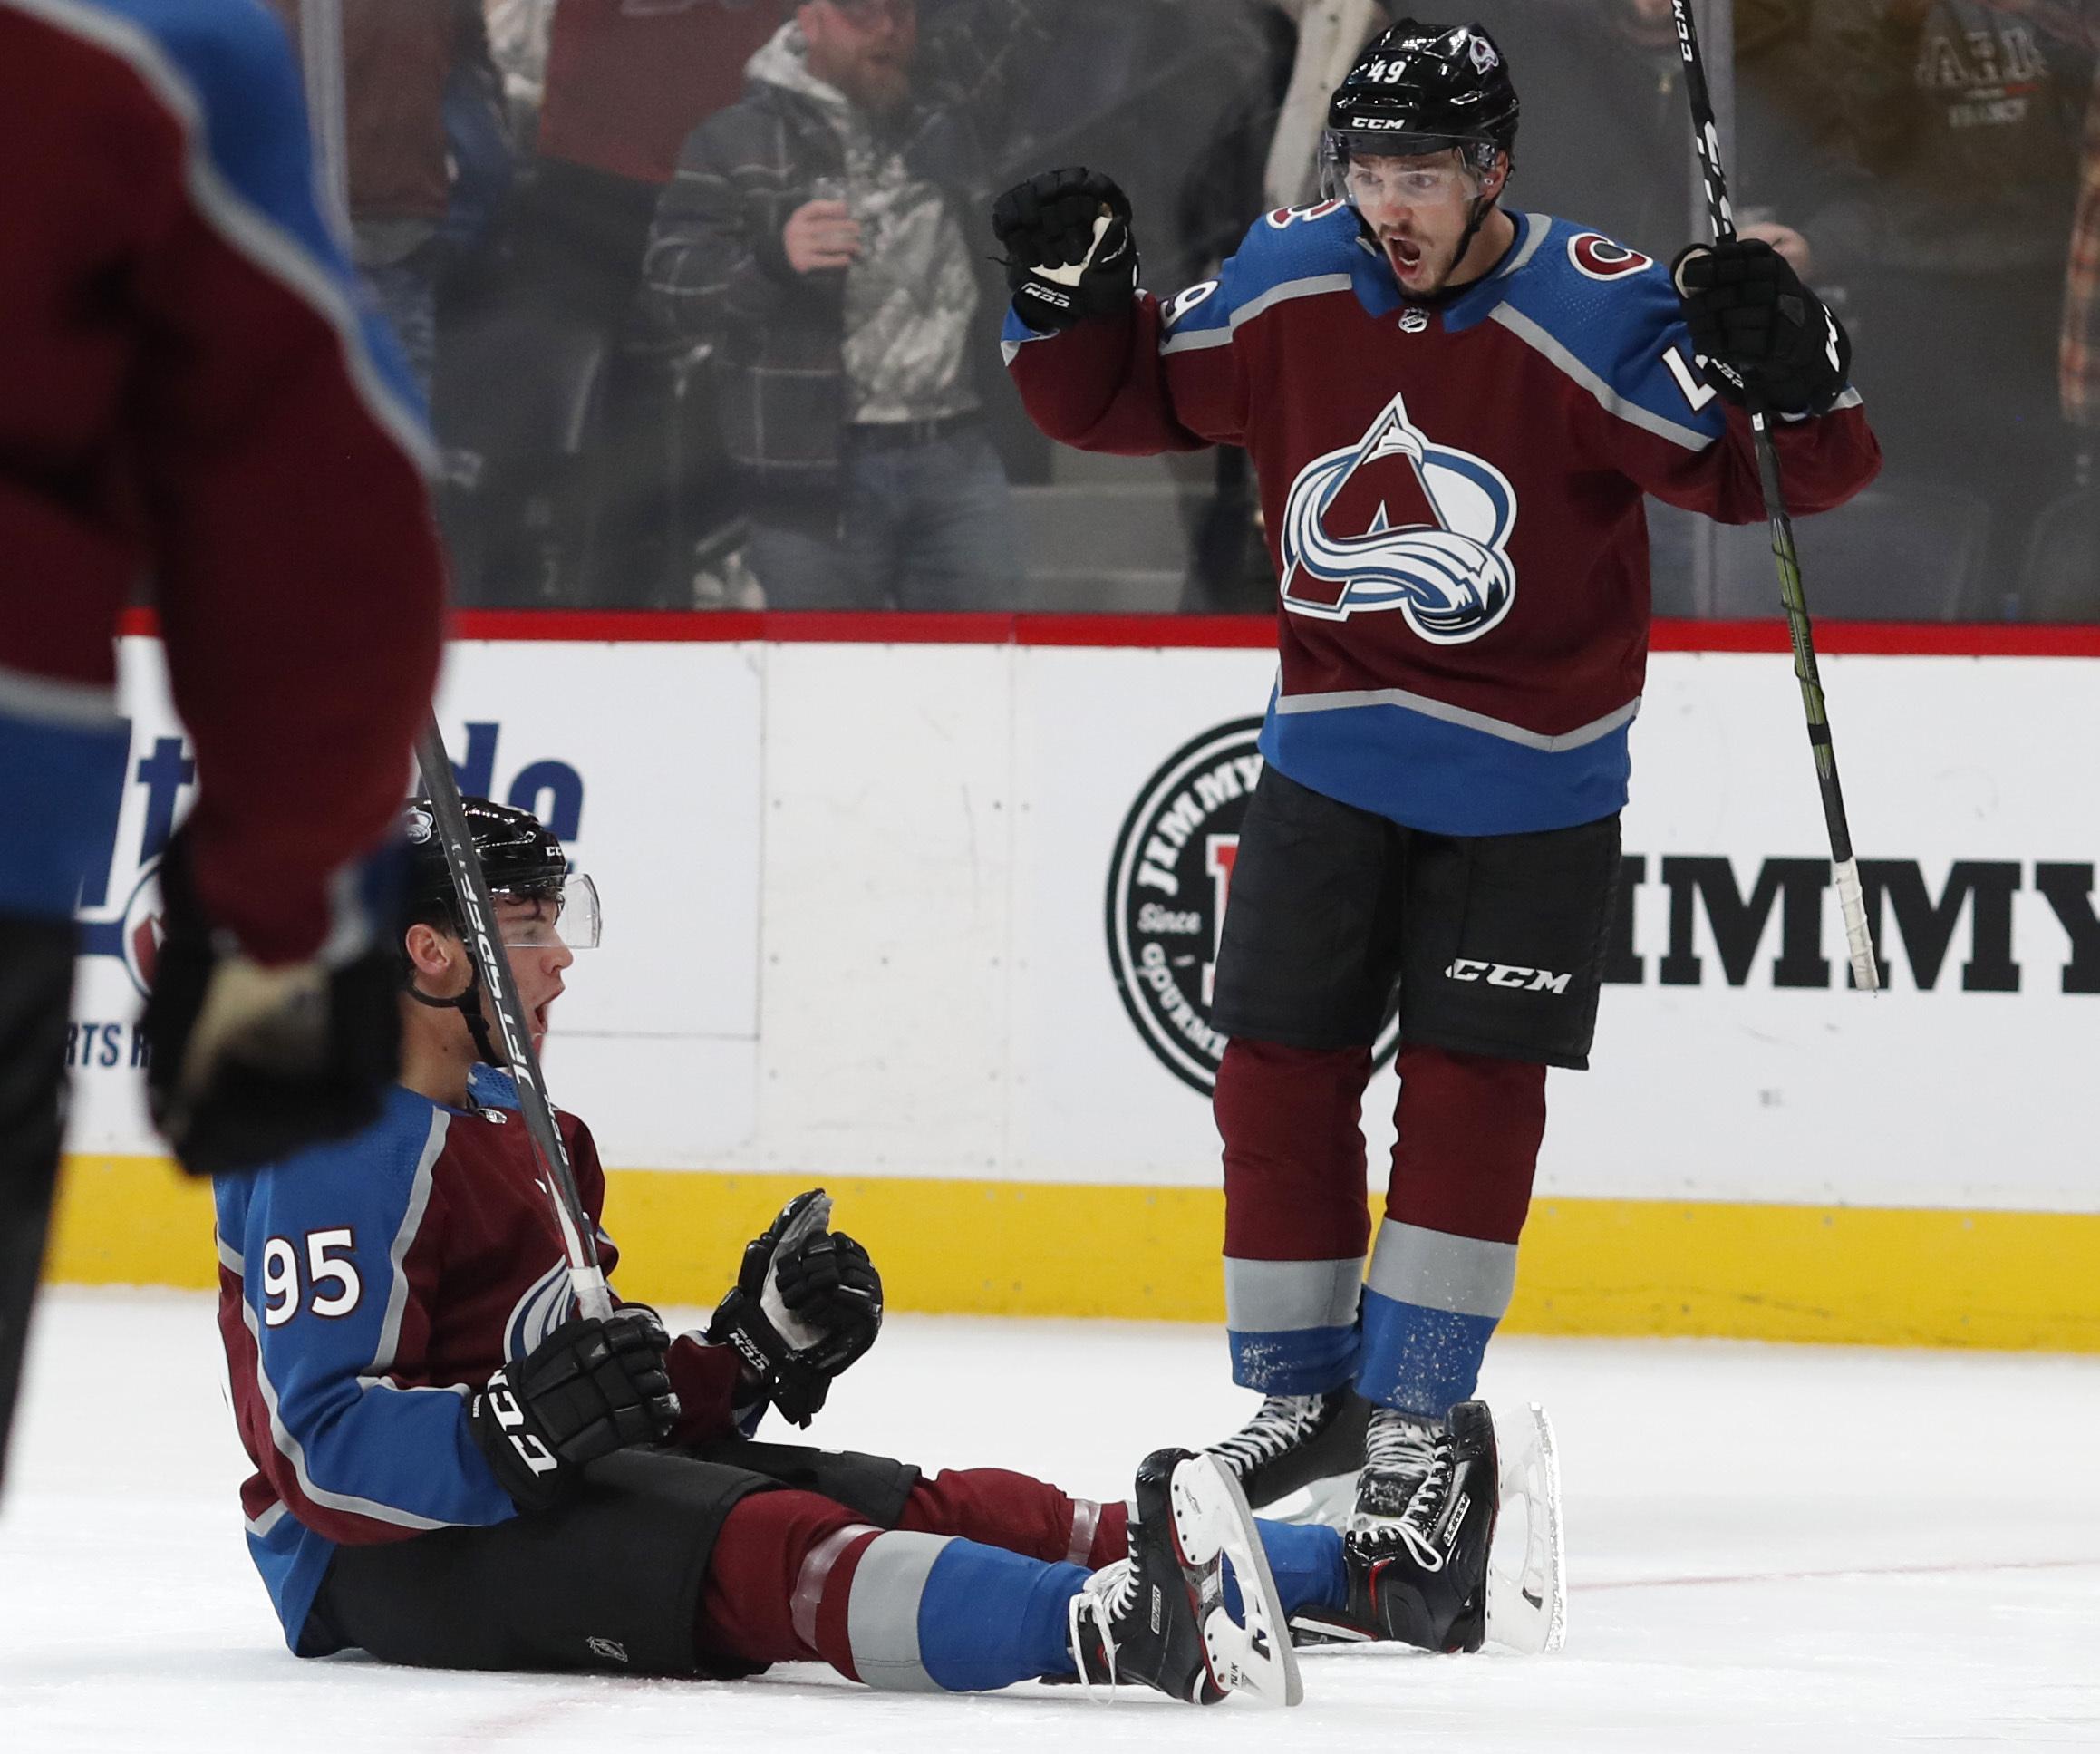 Burakovsky scores late goal, Avalanche beat Bruins 4-2